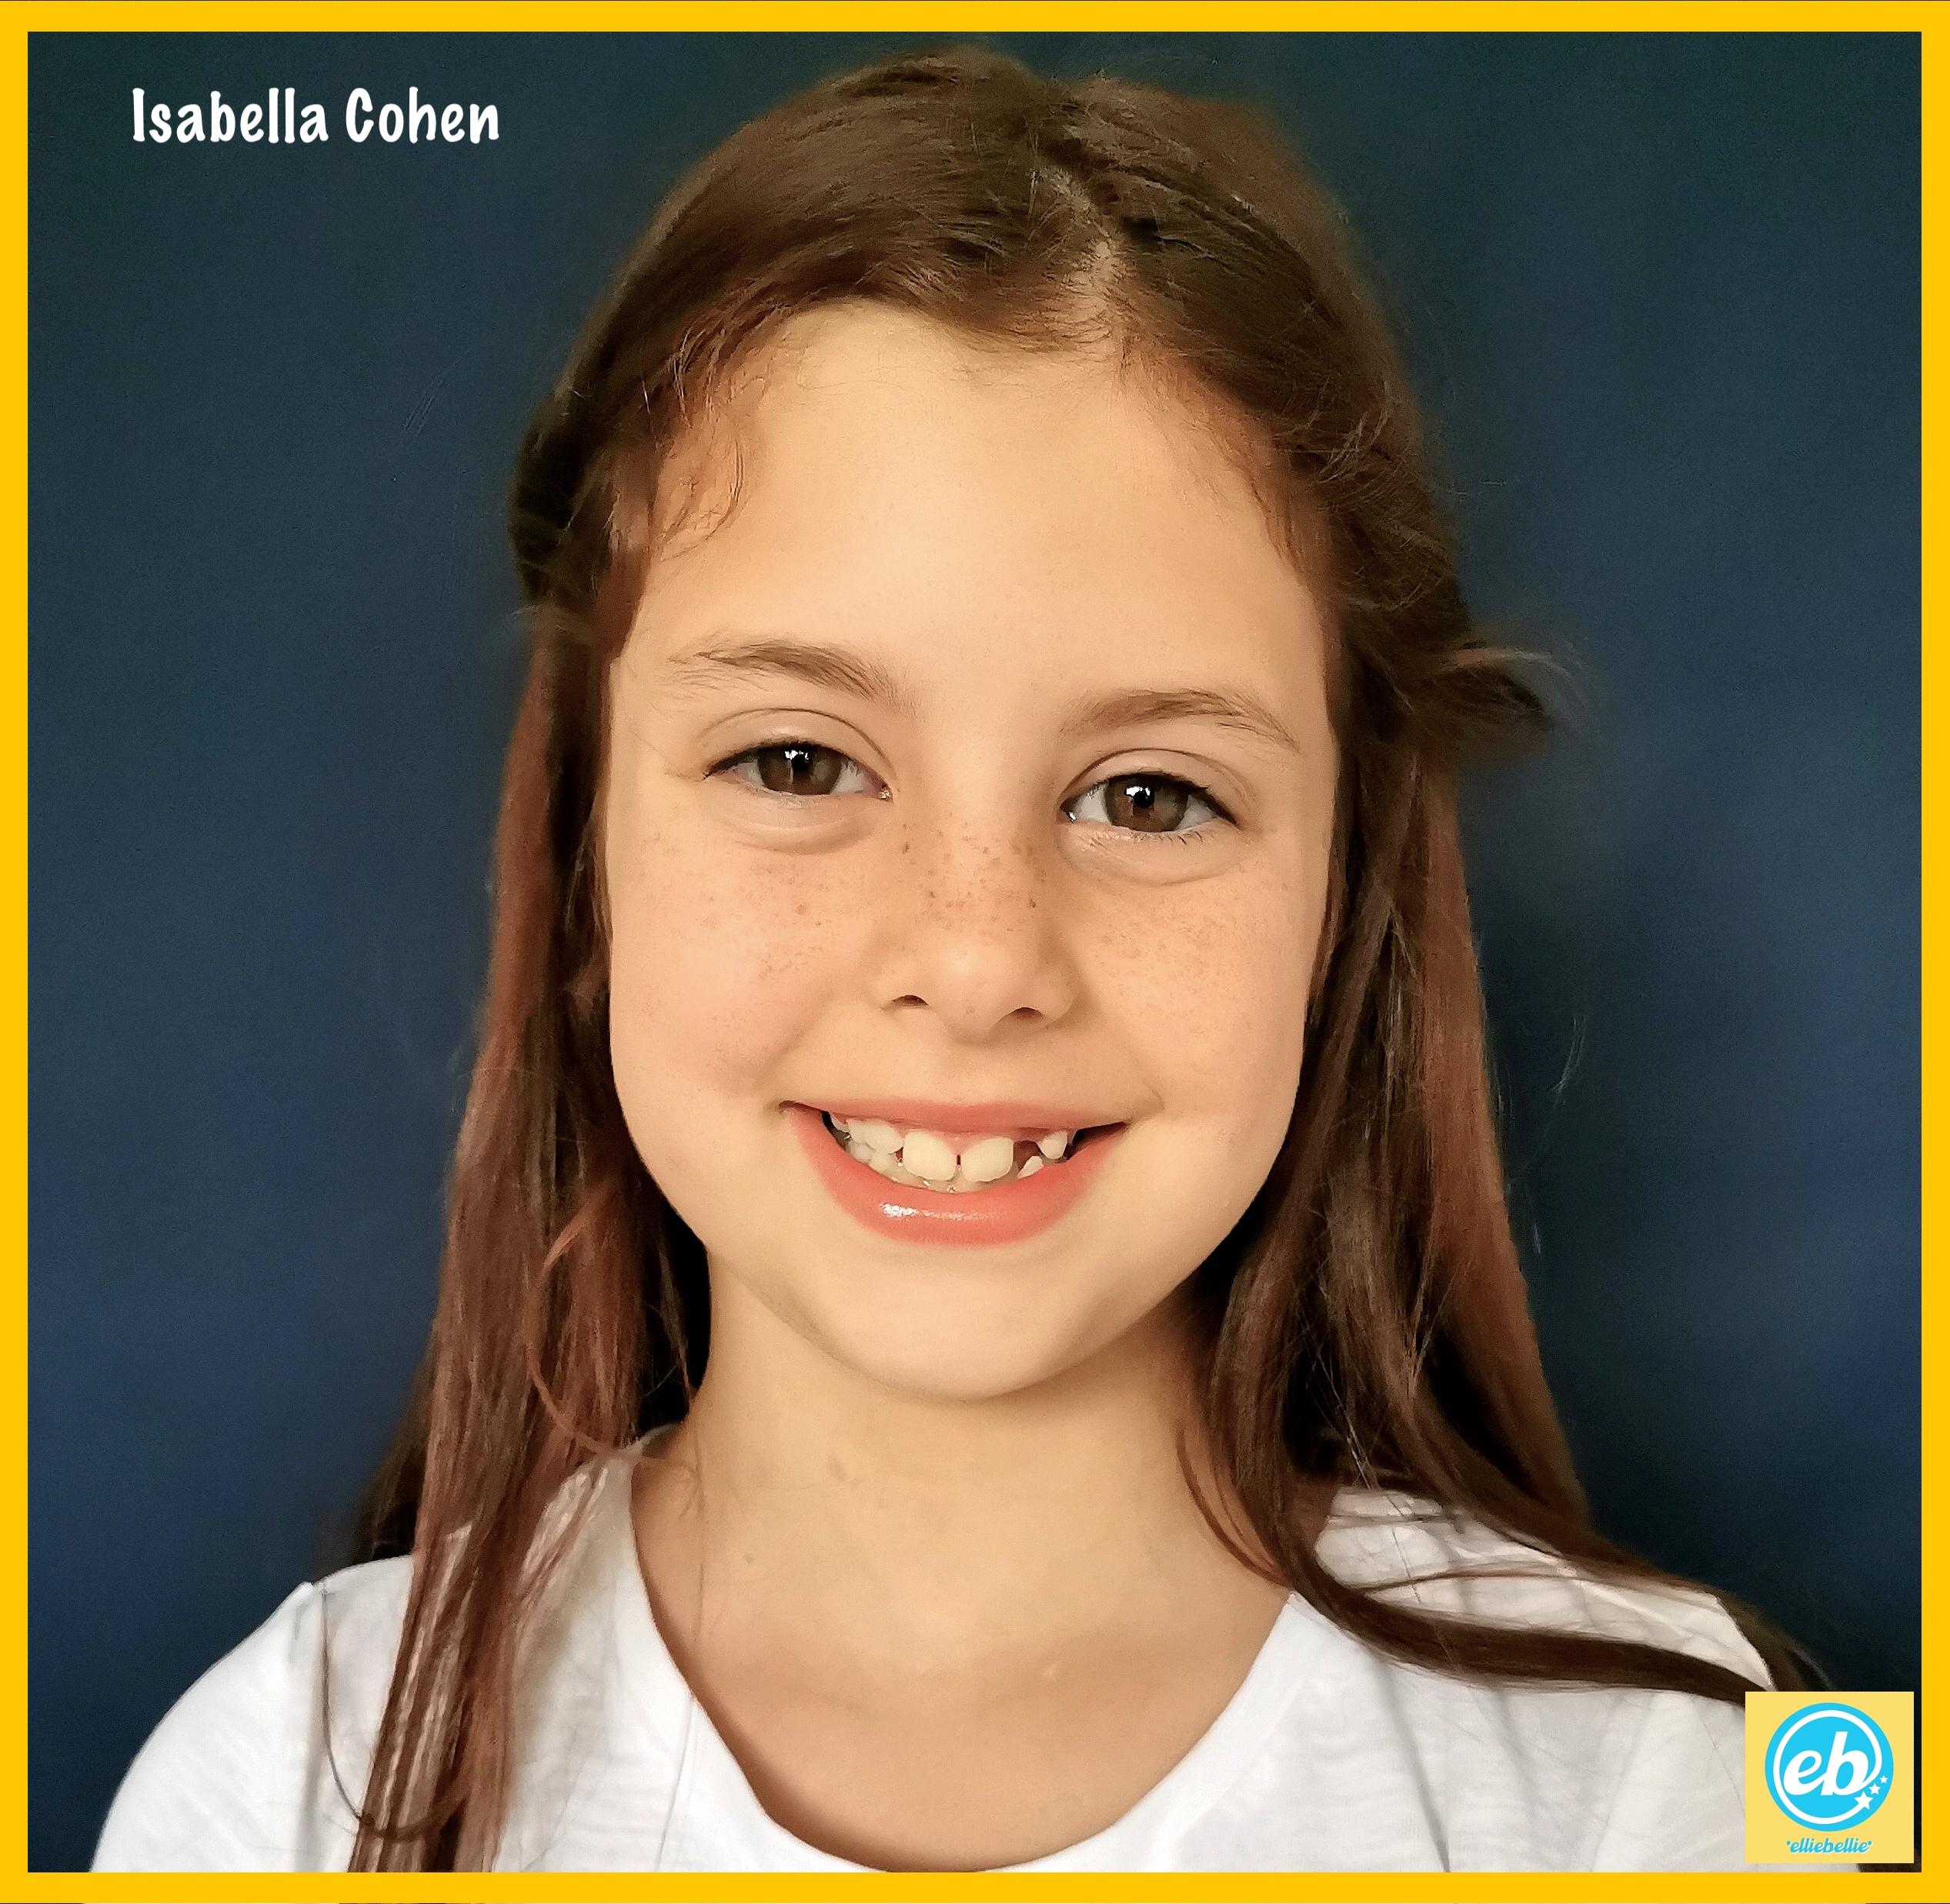 Isabella Cohen